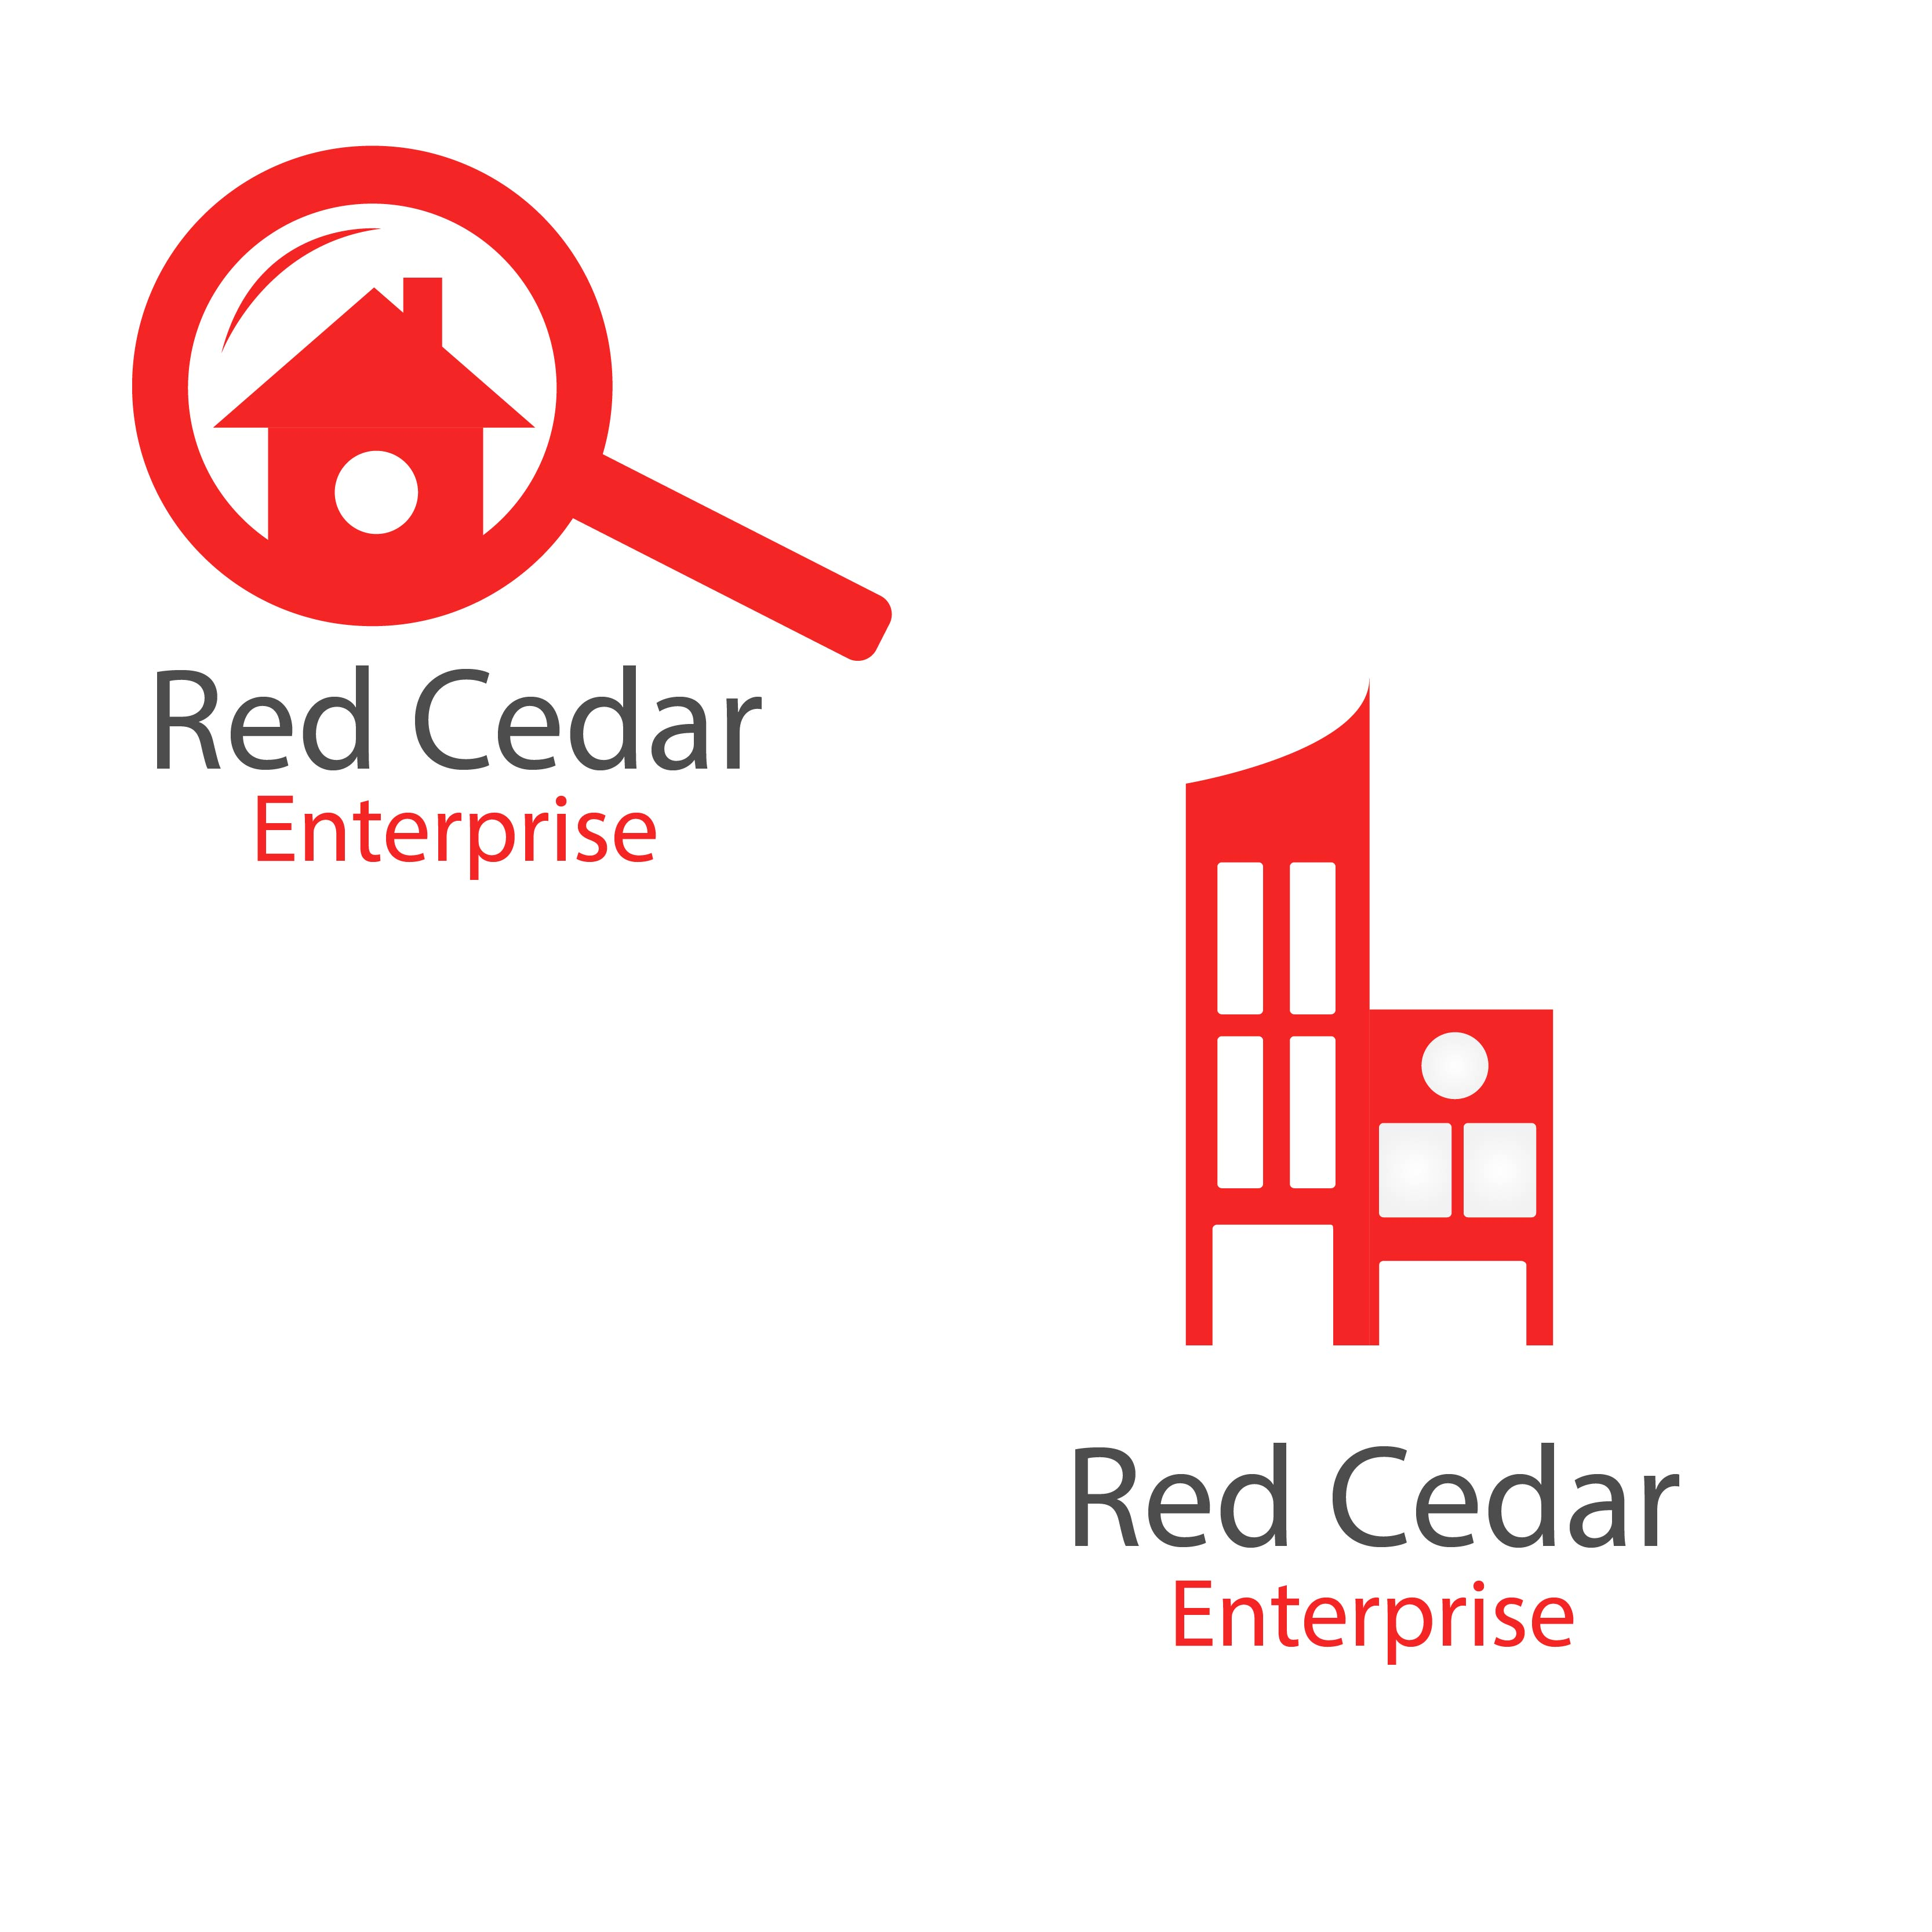 Logo Design by Muazzama Memon - Entry No. 116 in the Logo Design Contest Unique Logo Design Wanted for Red Cedar Enterprise.